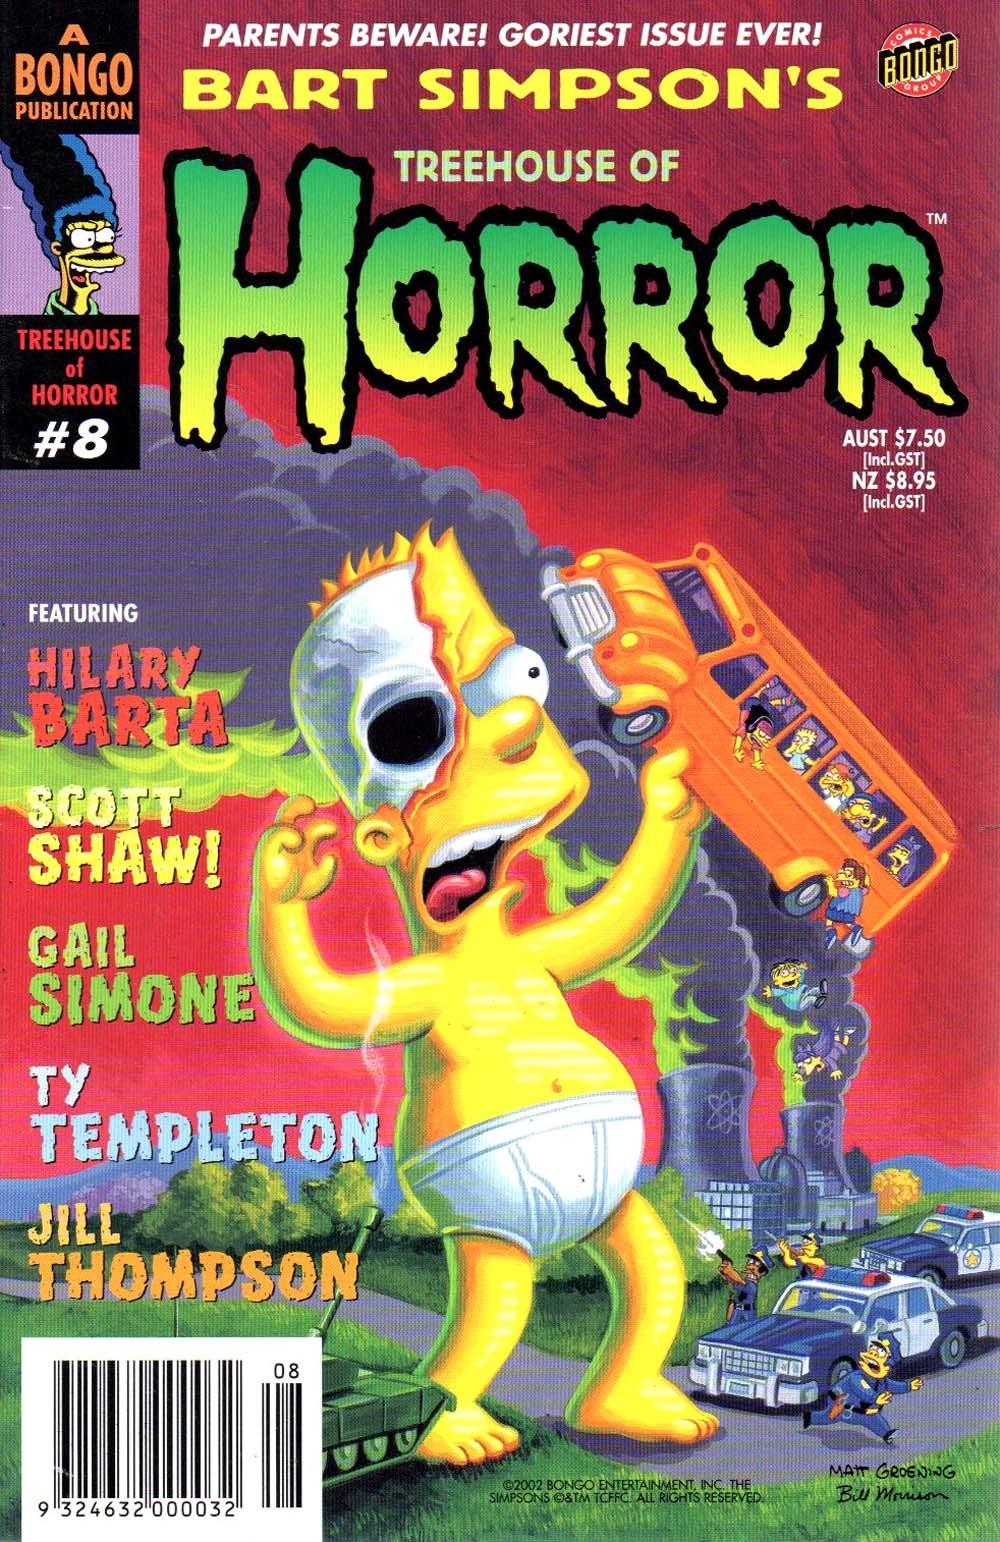 Bart Simpson's Treehouse of Horror (AU) 8 (2).jpg